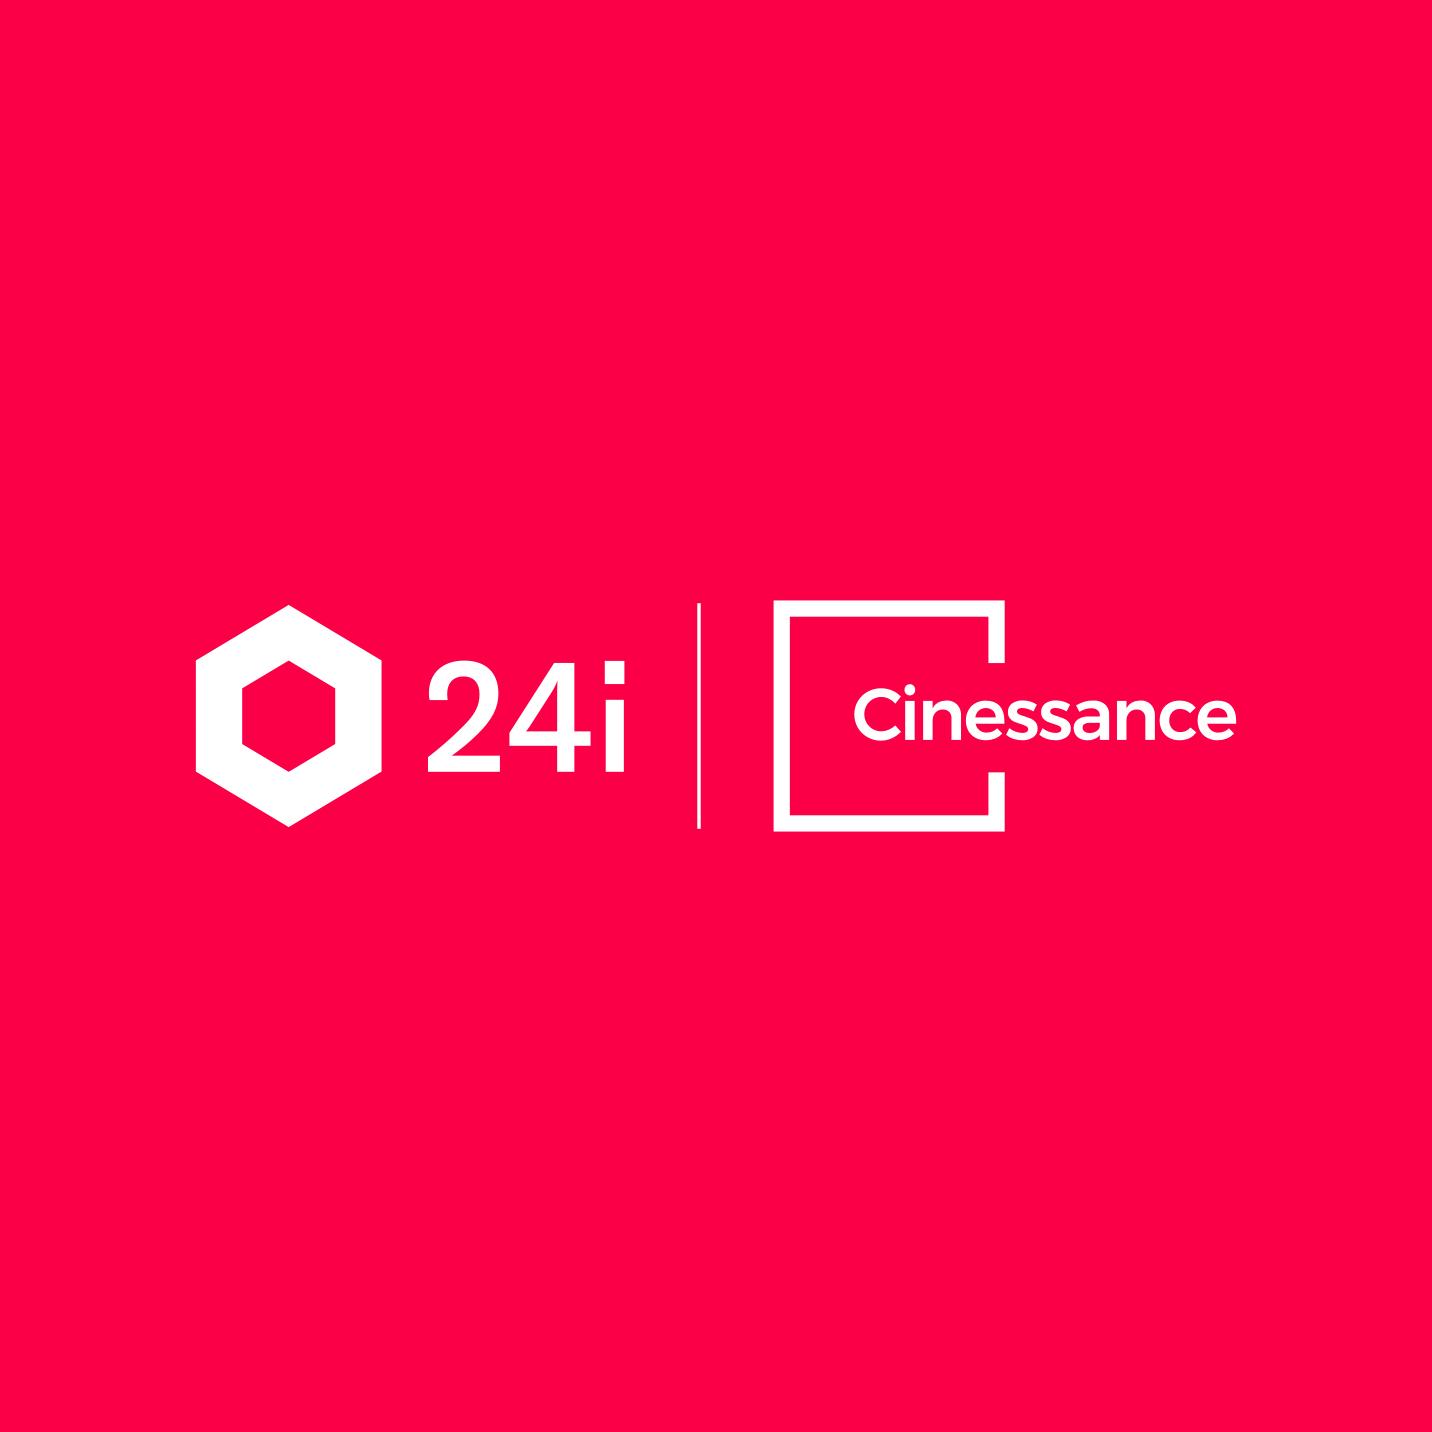 24i-cinessance